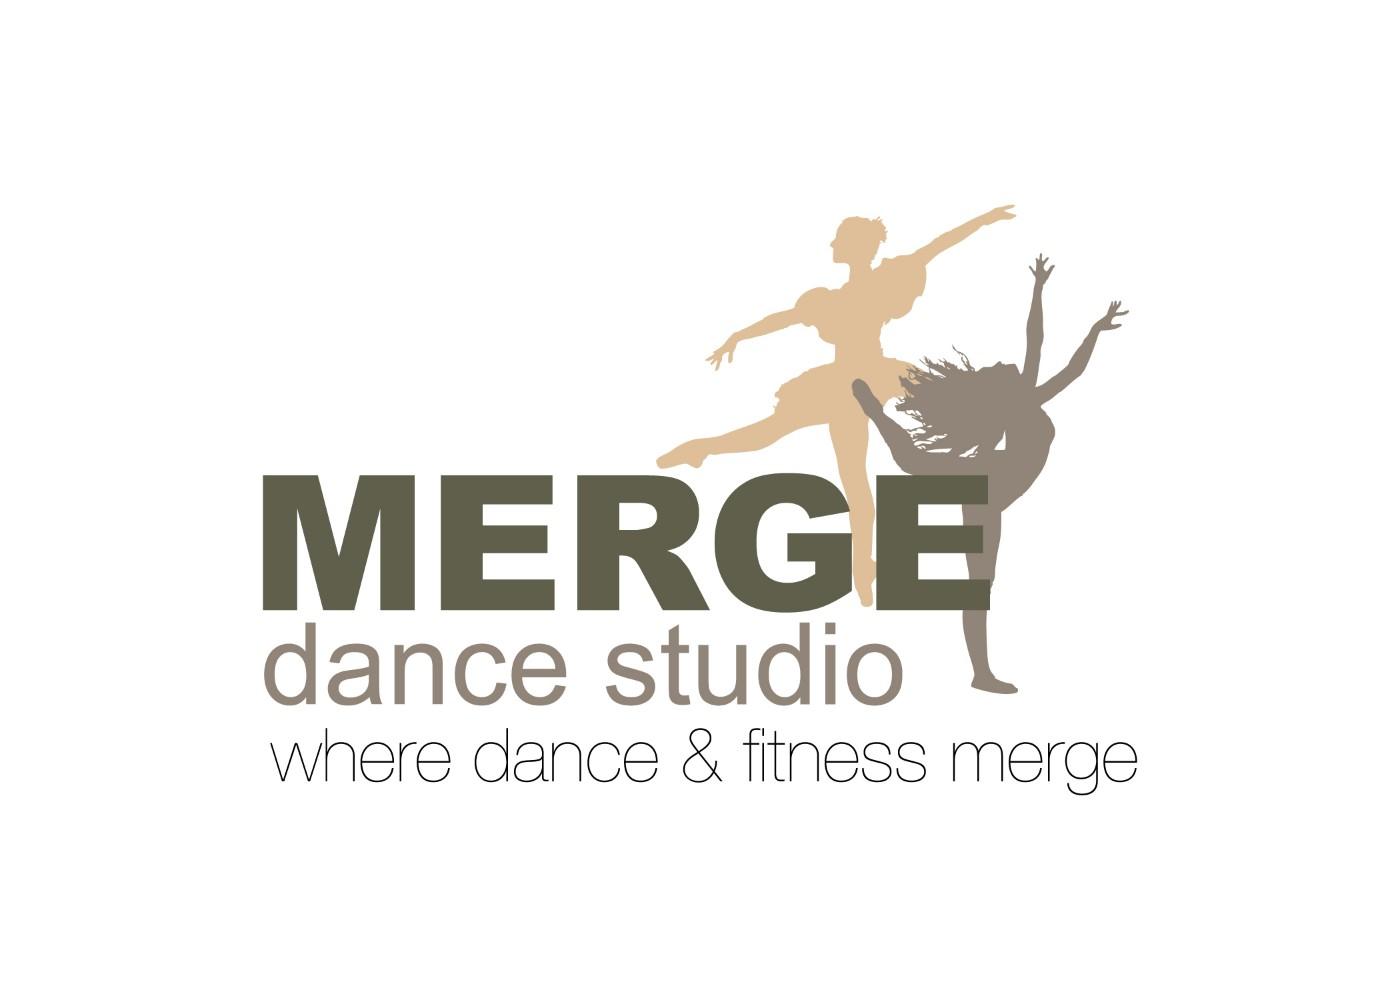 MERGE_logo_color_tag